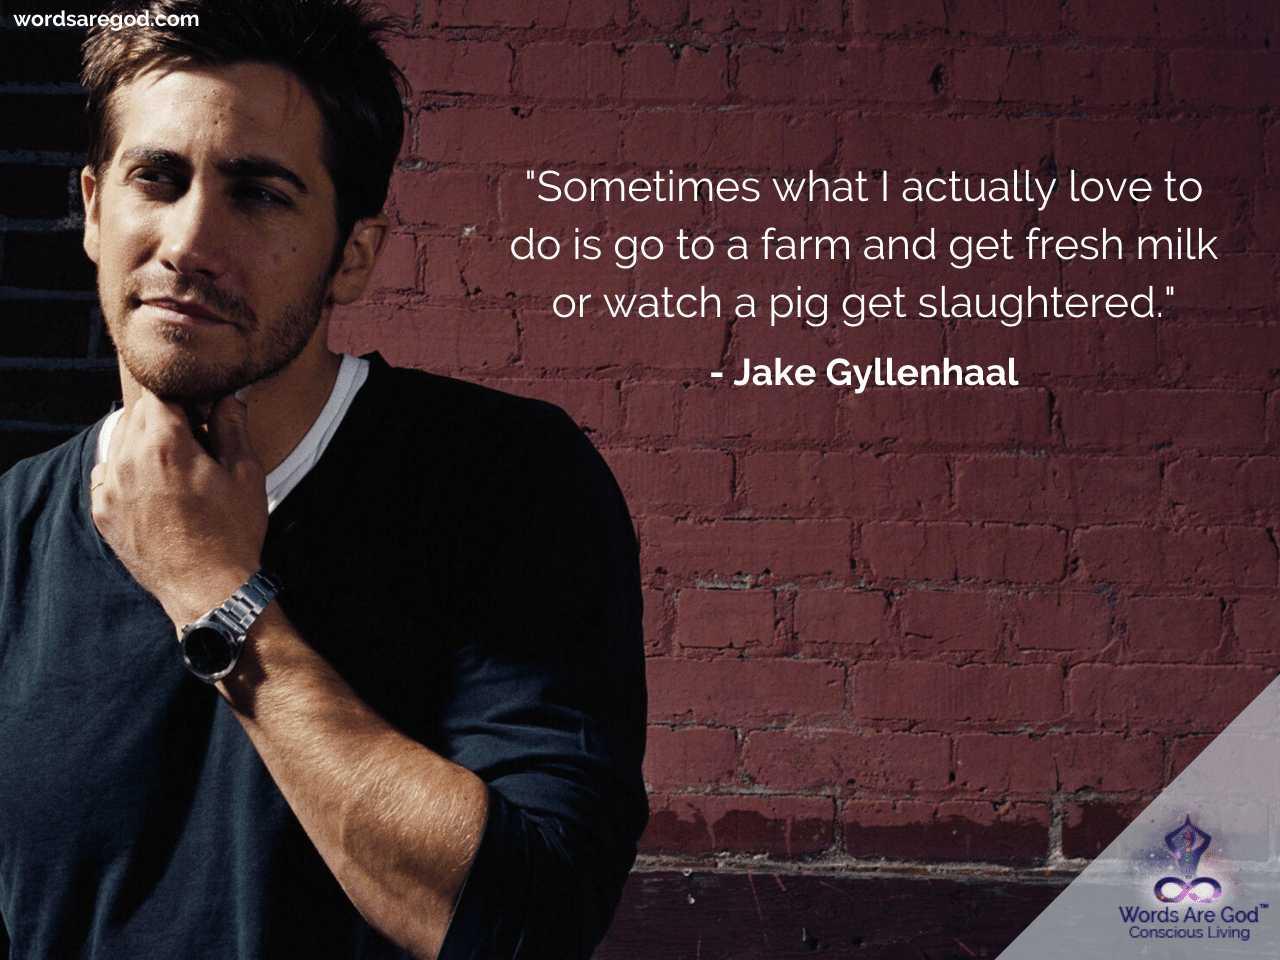 Jake Gyllenhaal Motivational Quotes by Jake Gyllenhaal